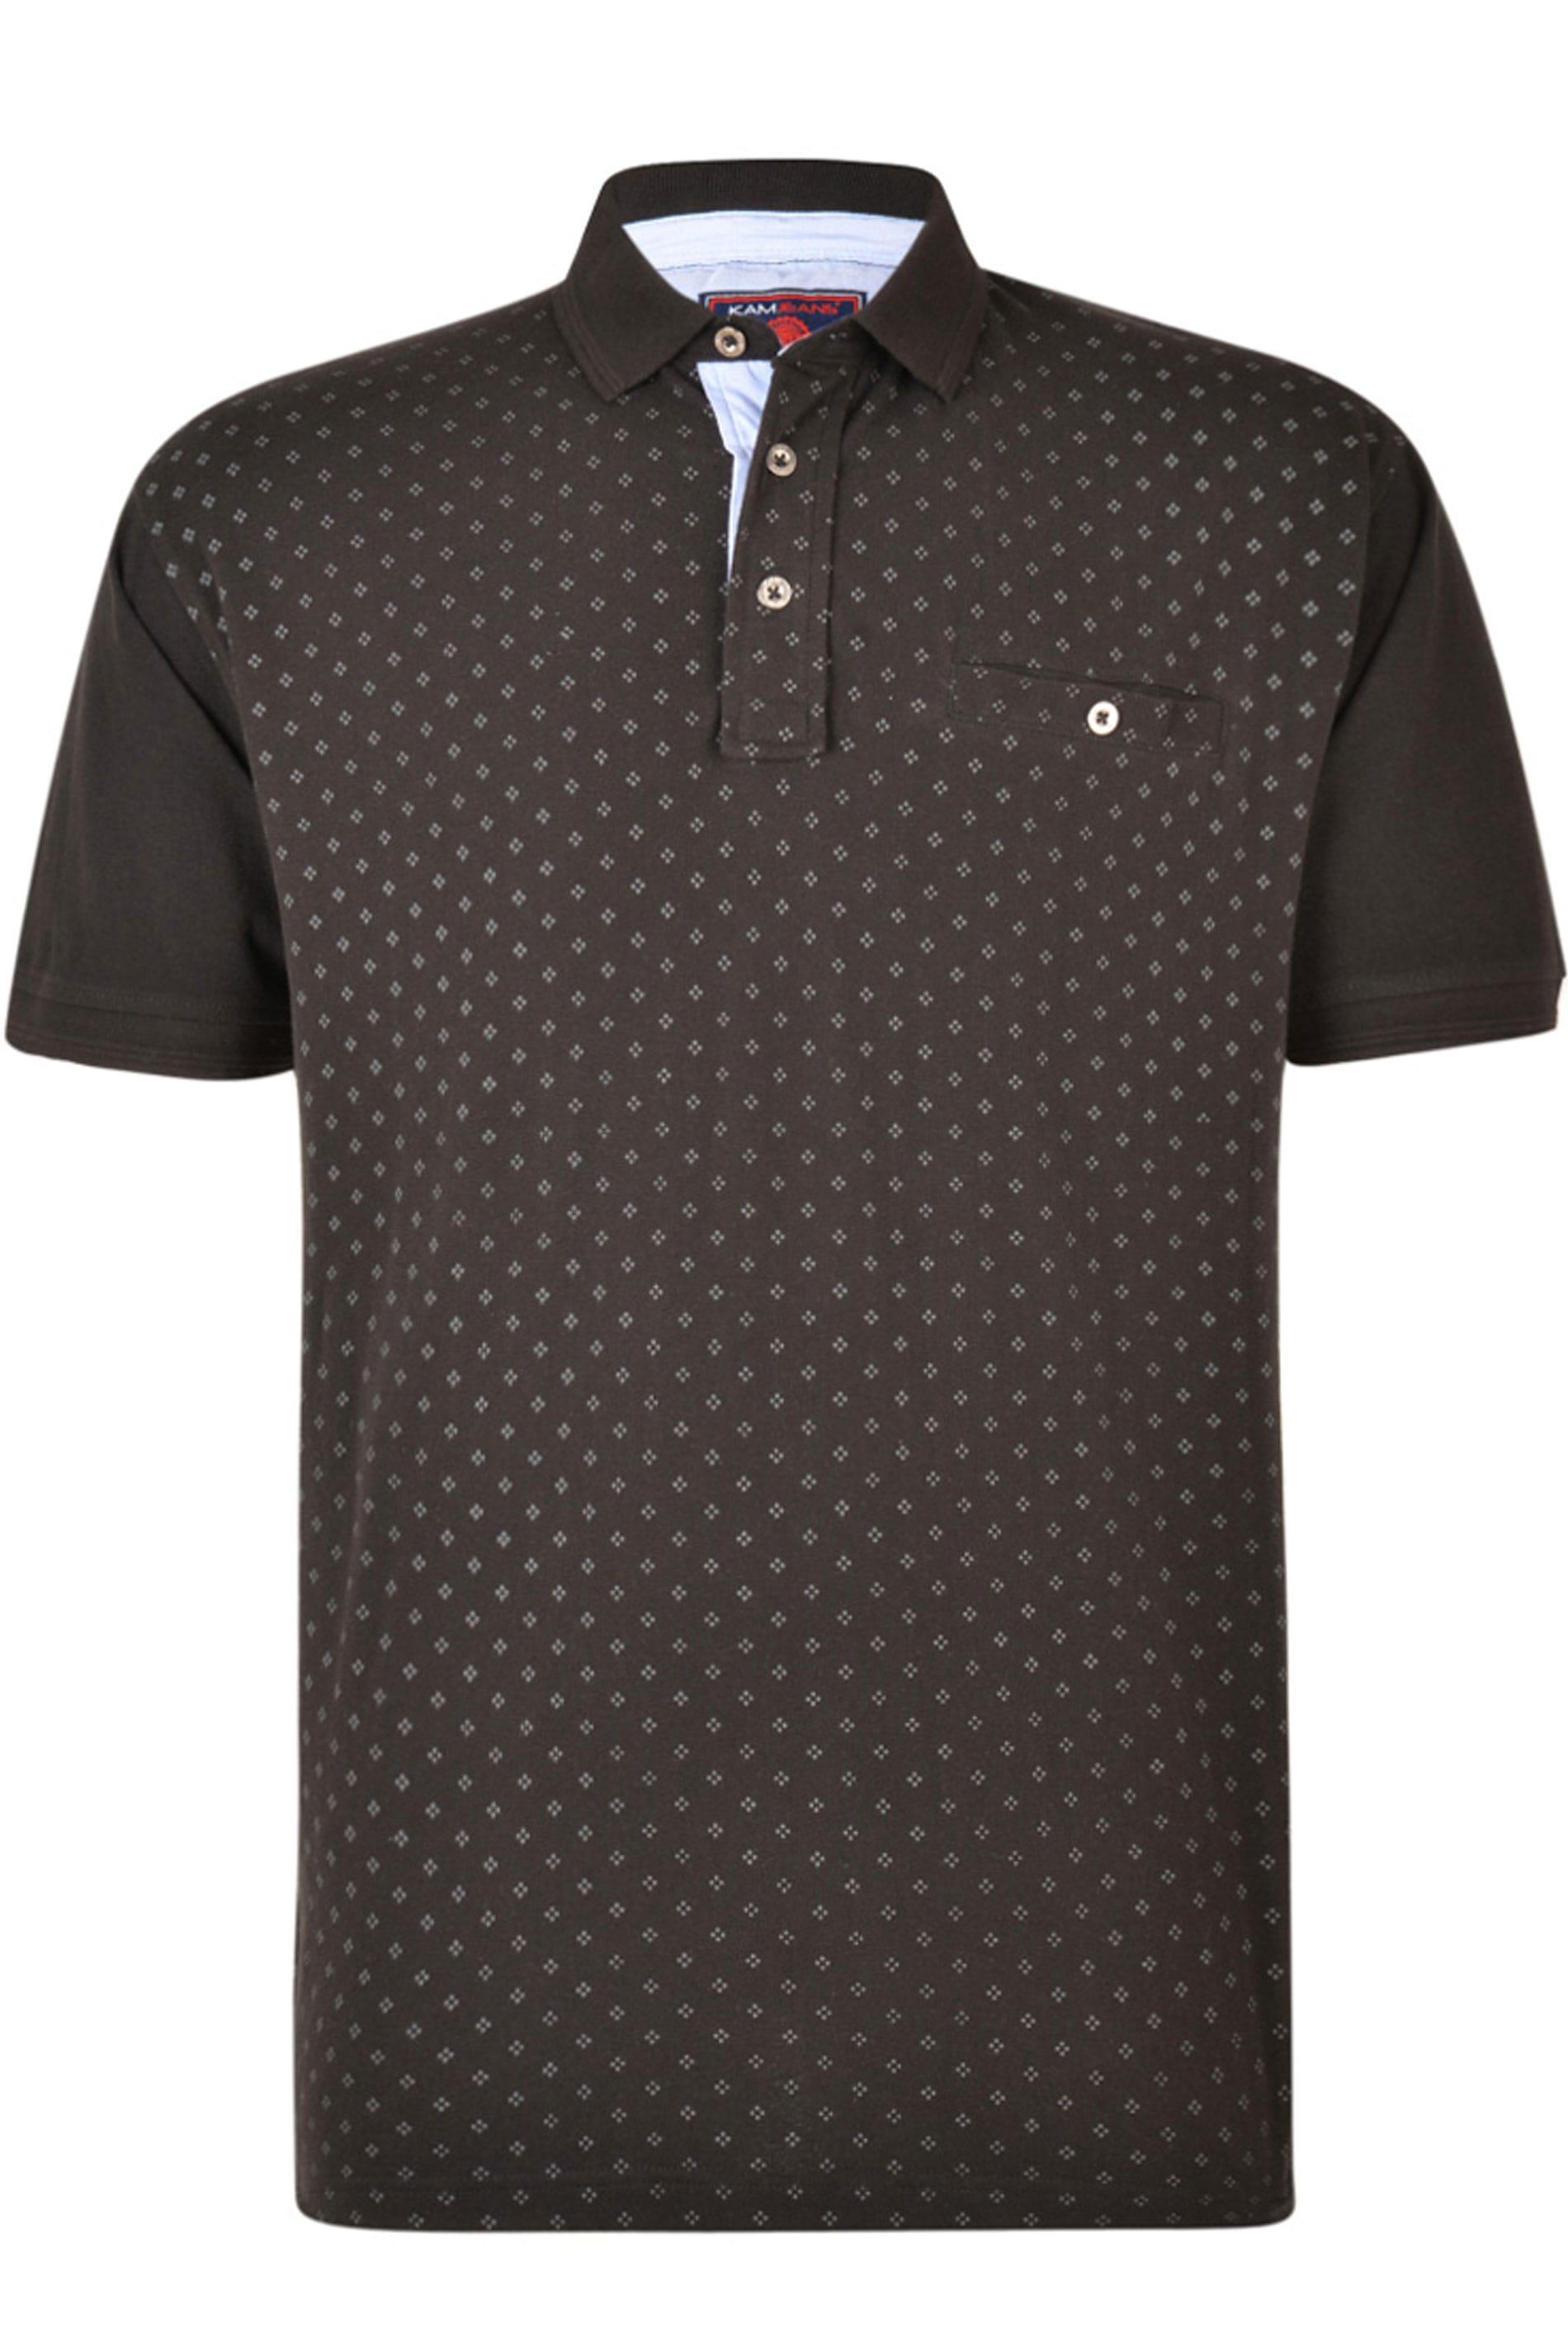 KAM Black Dobby Print Polo Shirt